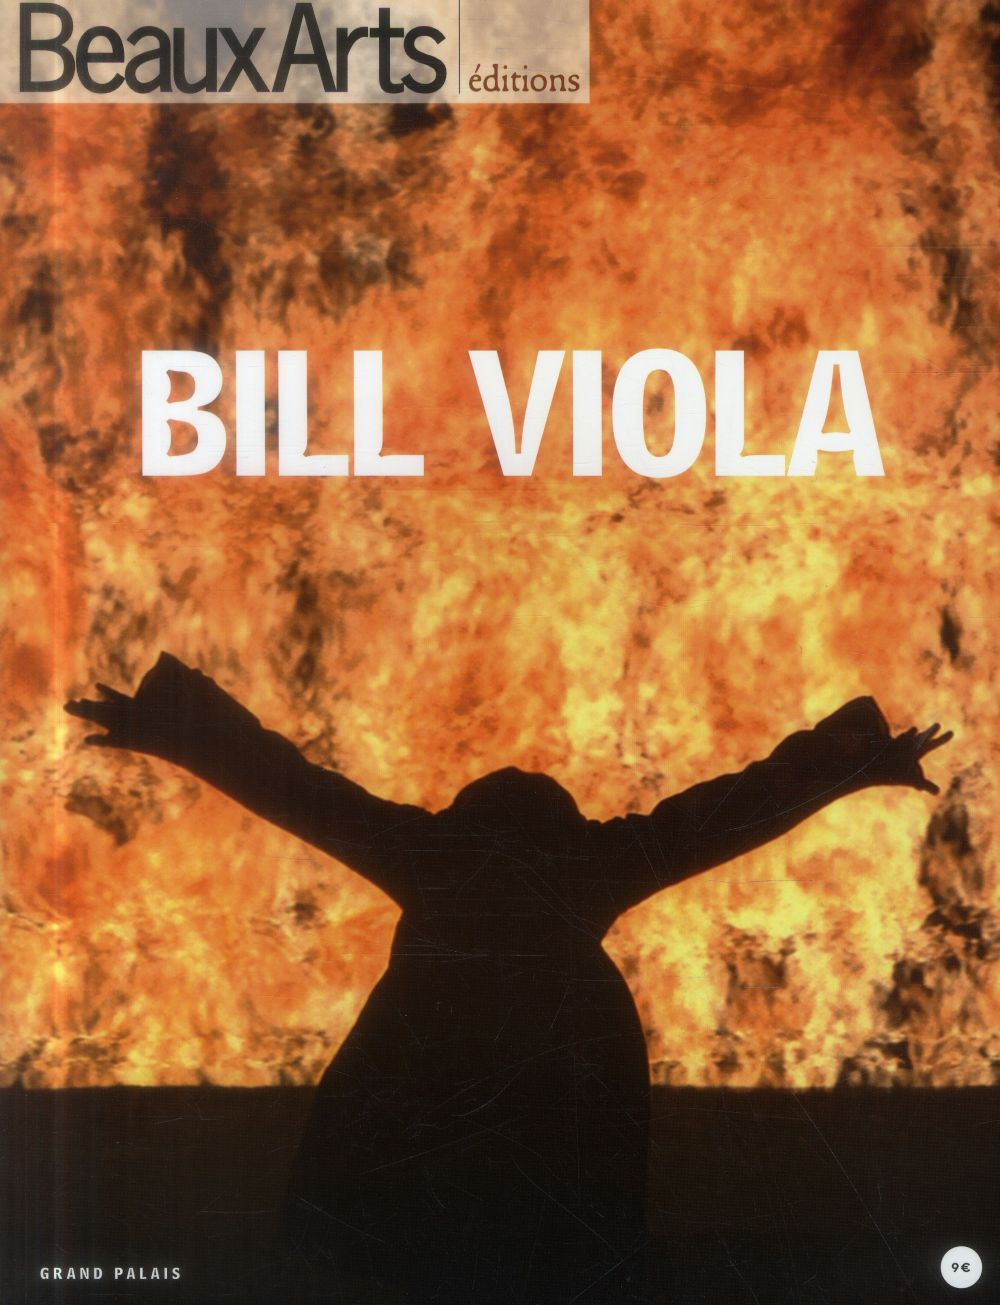 Bill viola au grand palais